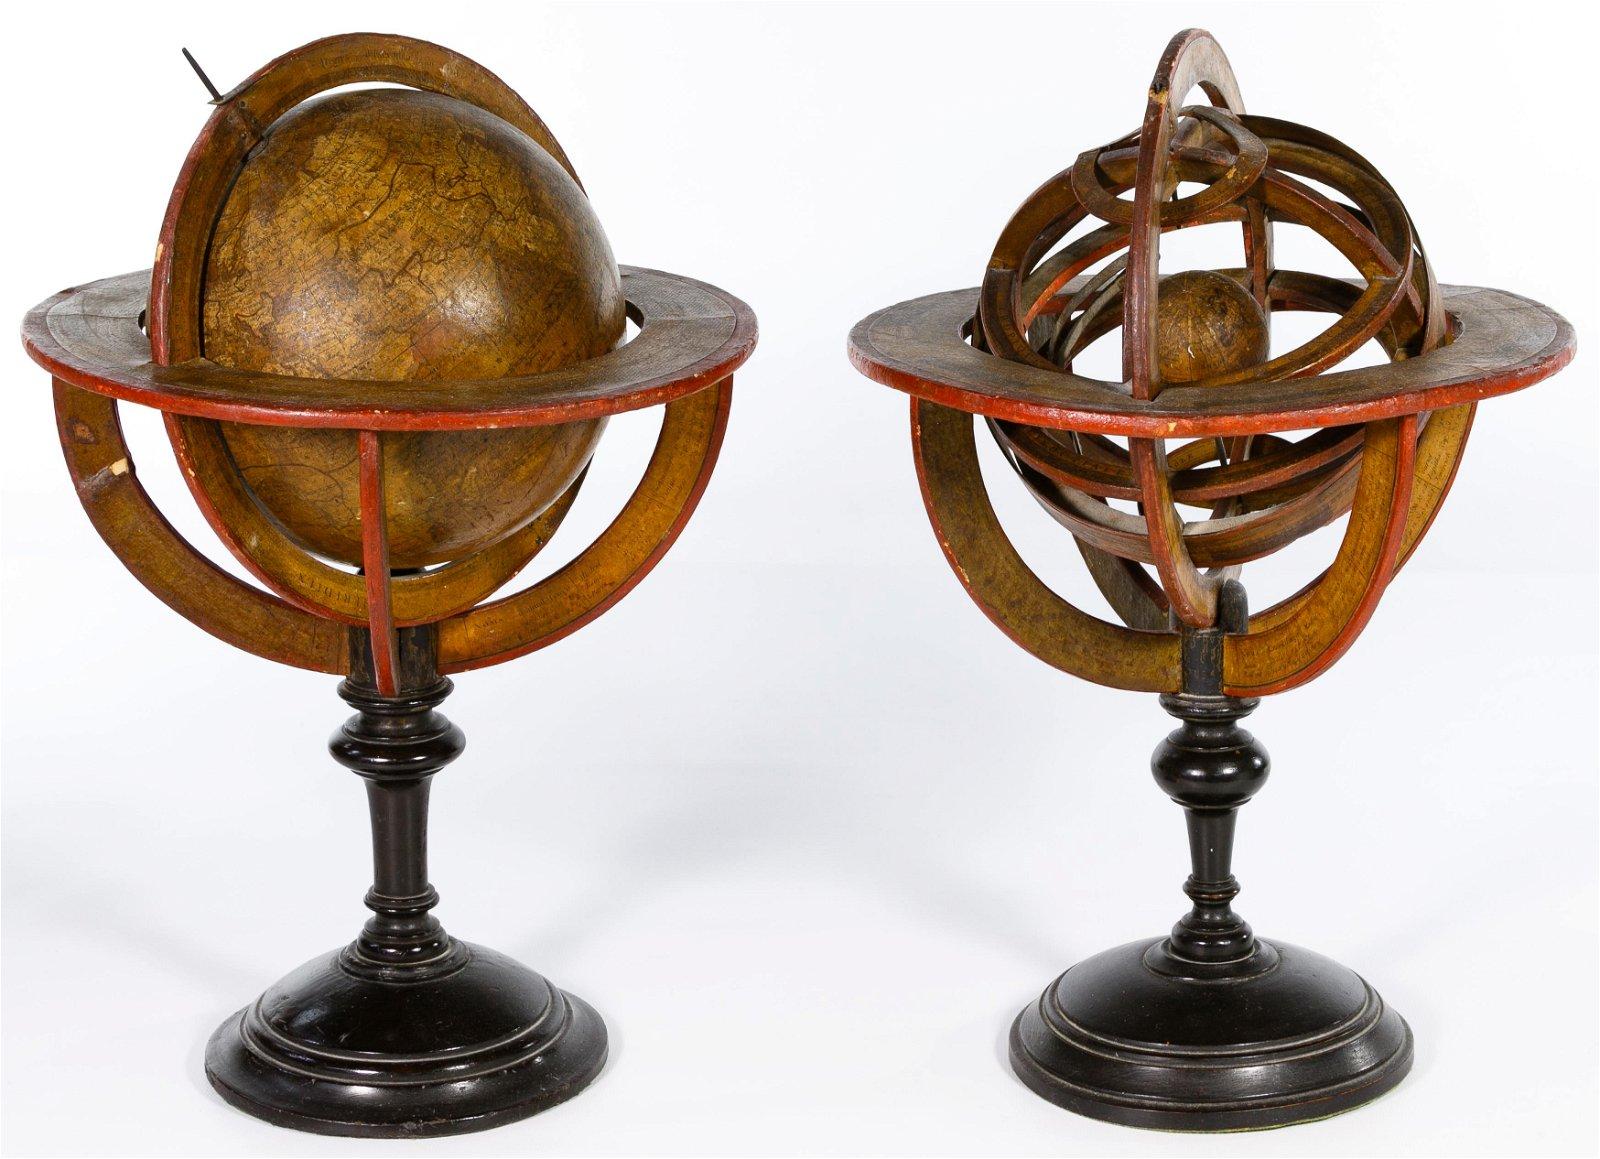 Terrestrial Globe and Armillary Sphere